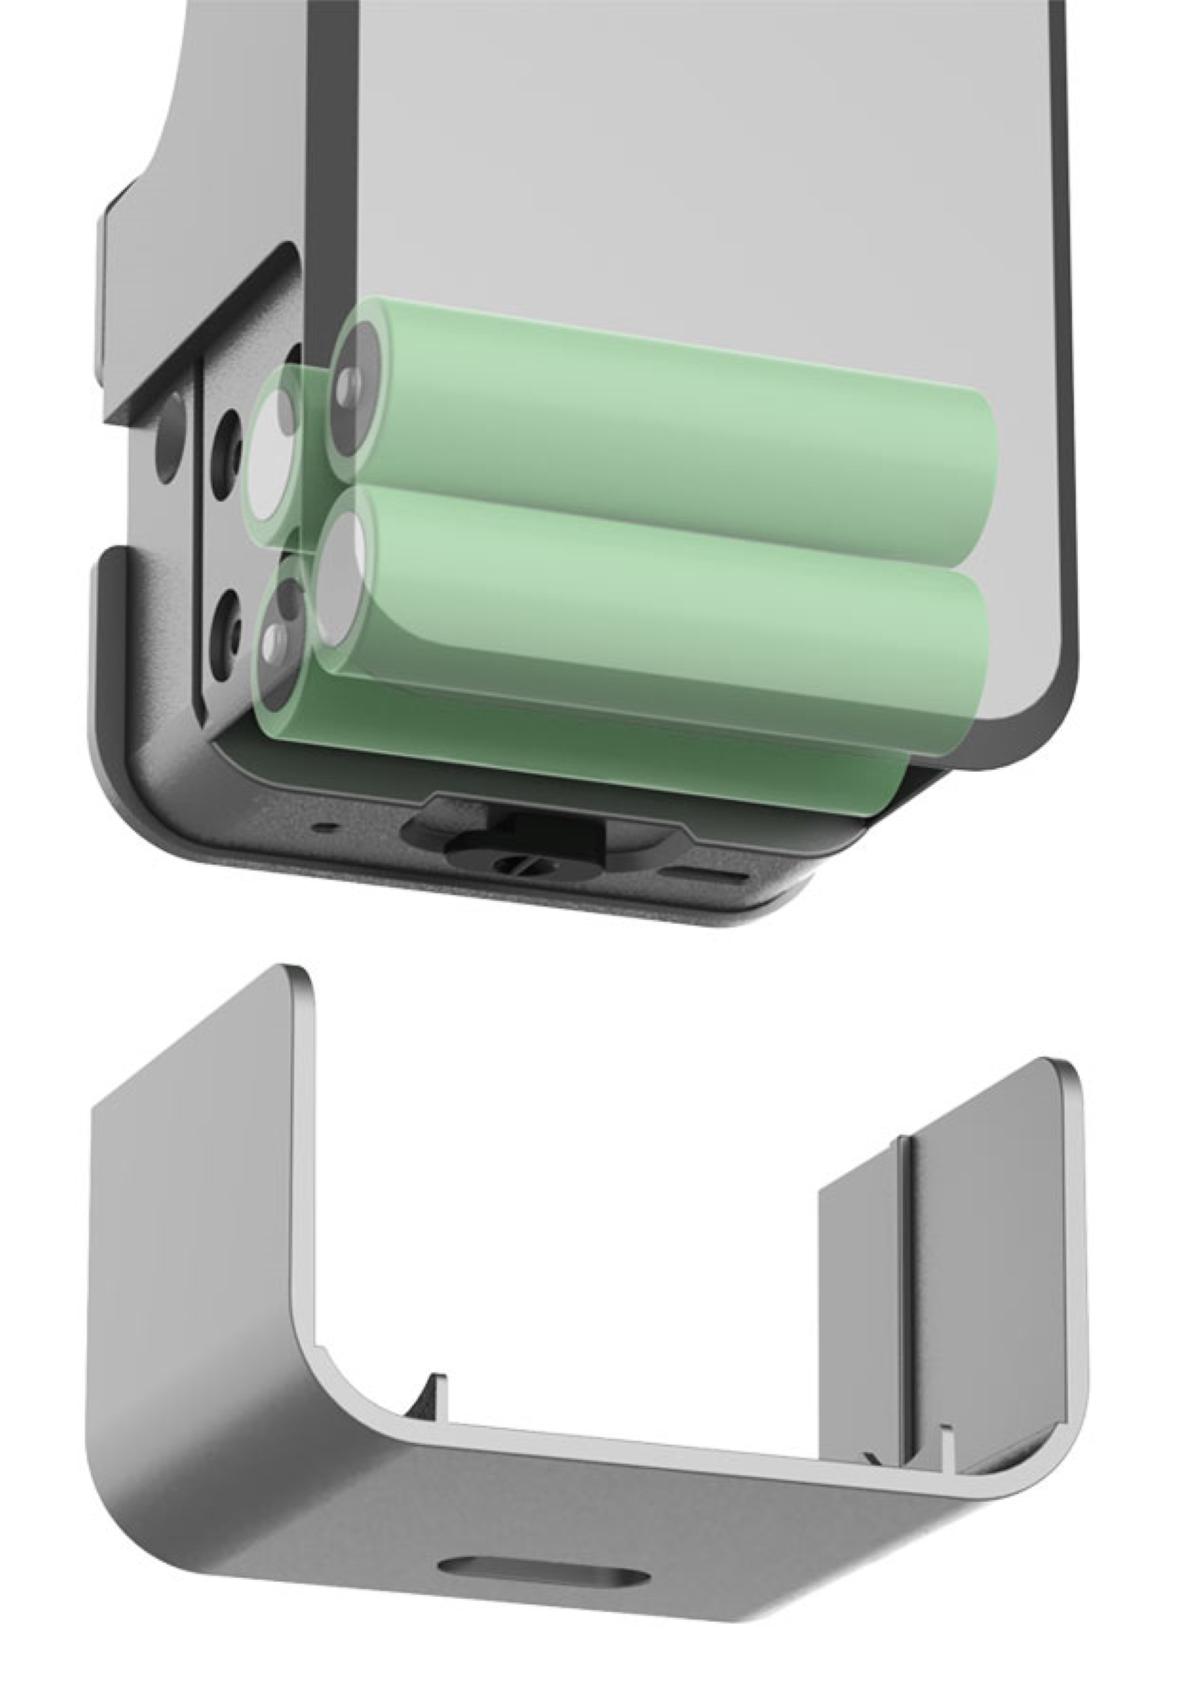 Gimdow Smart Lock - Main Unit Batteries Installation